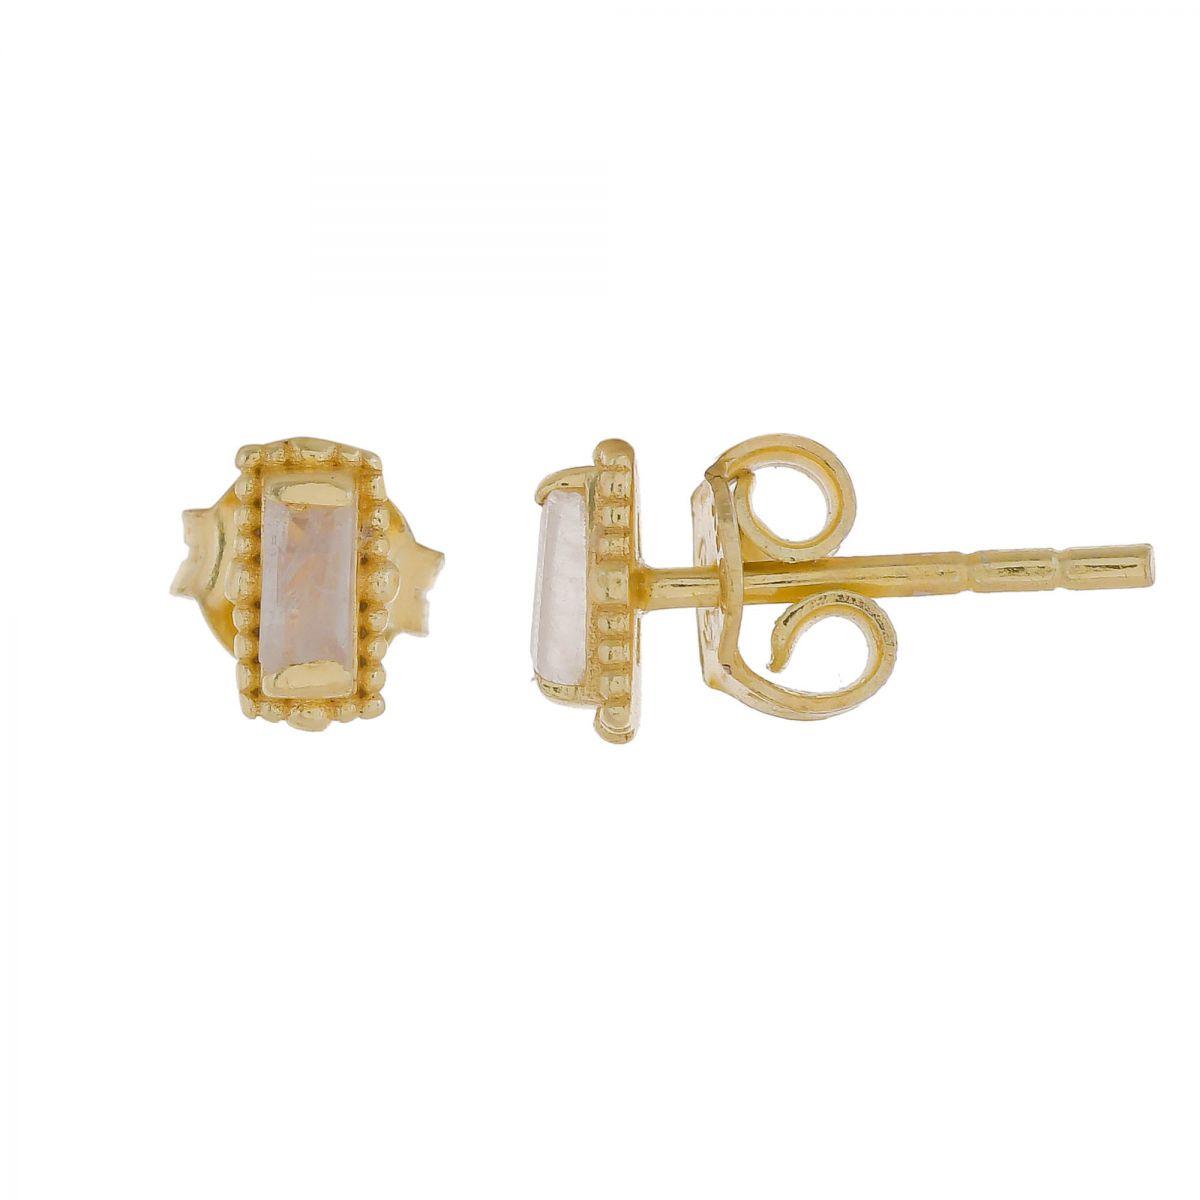 e earring moonstone stud gold plated